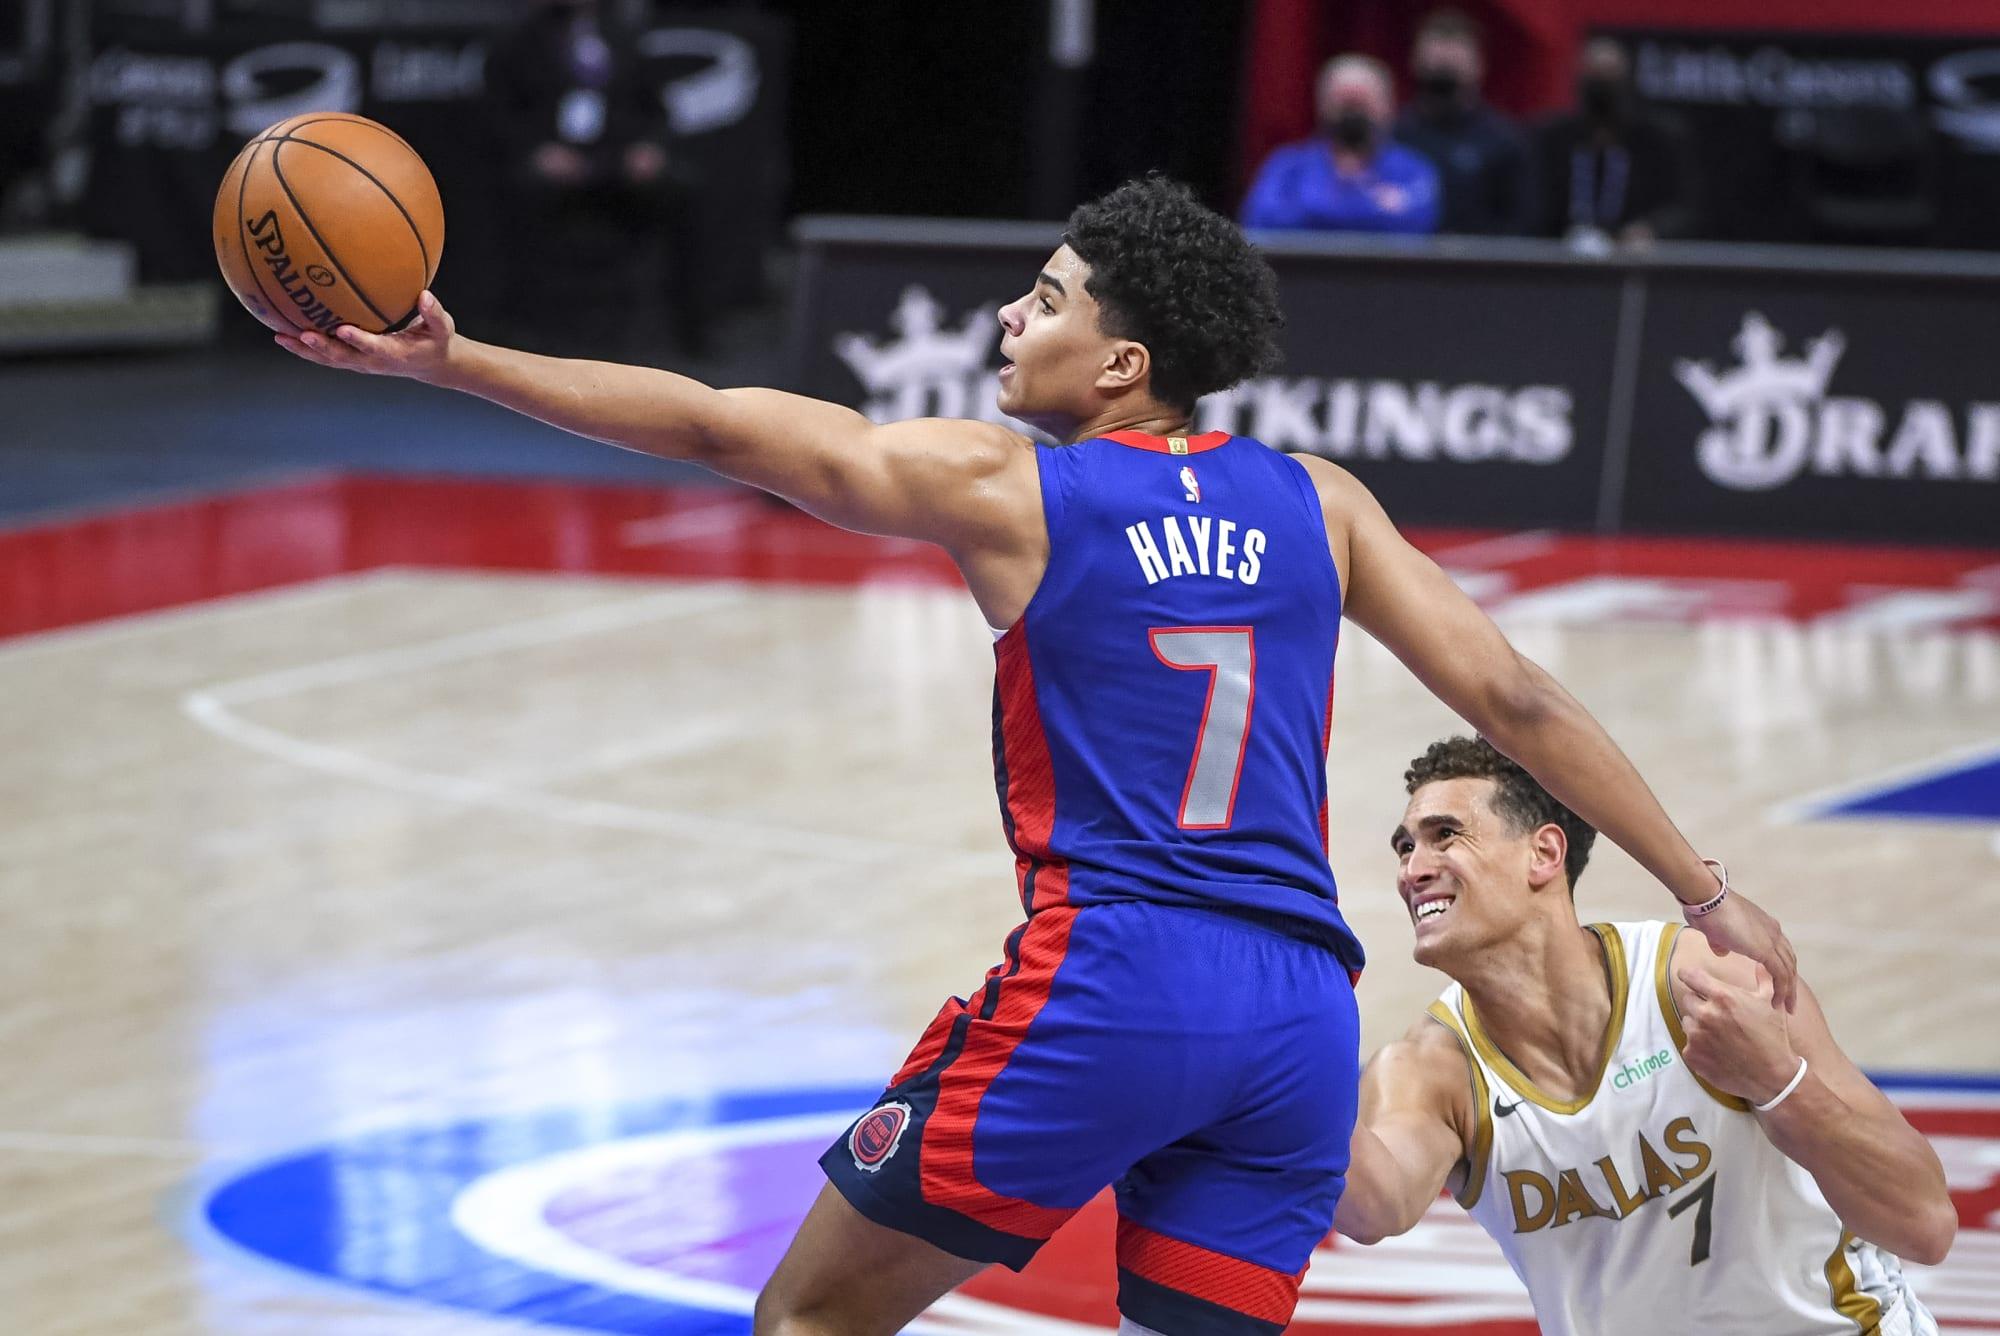 Detroit Pistons: 3 reasons Killian Hayes will be better than Haliburton